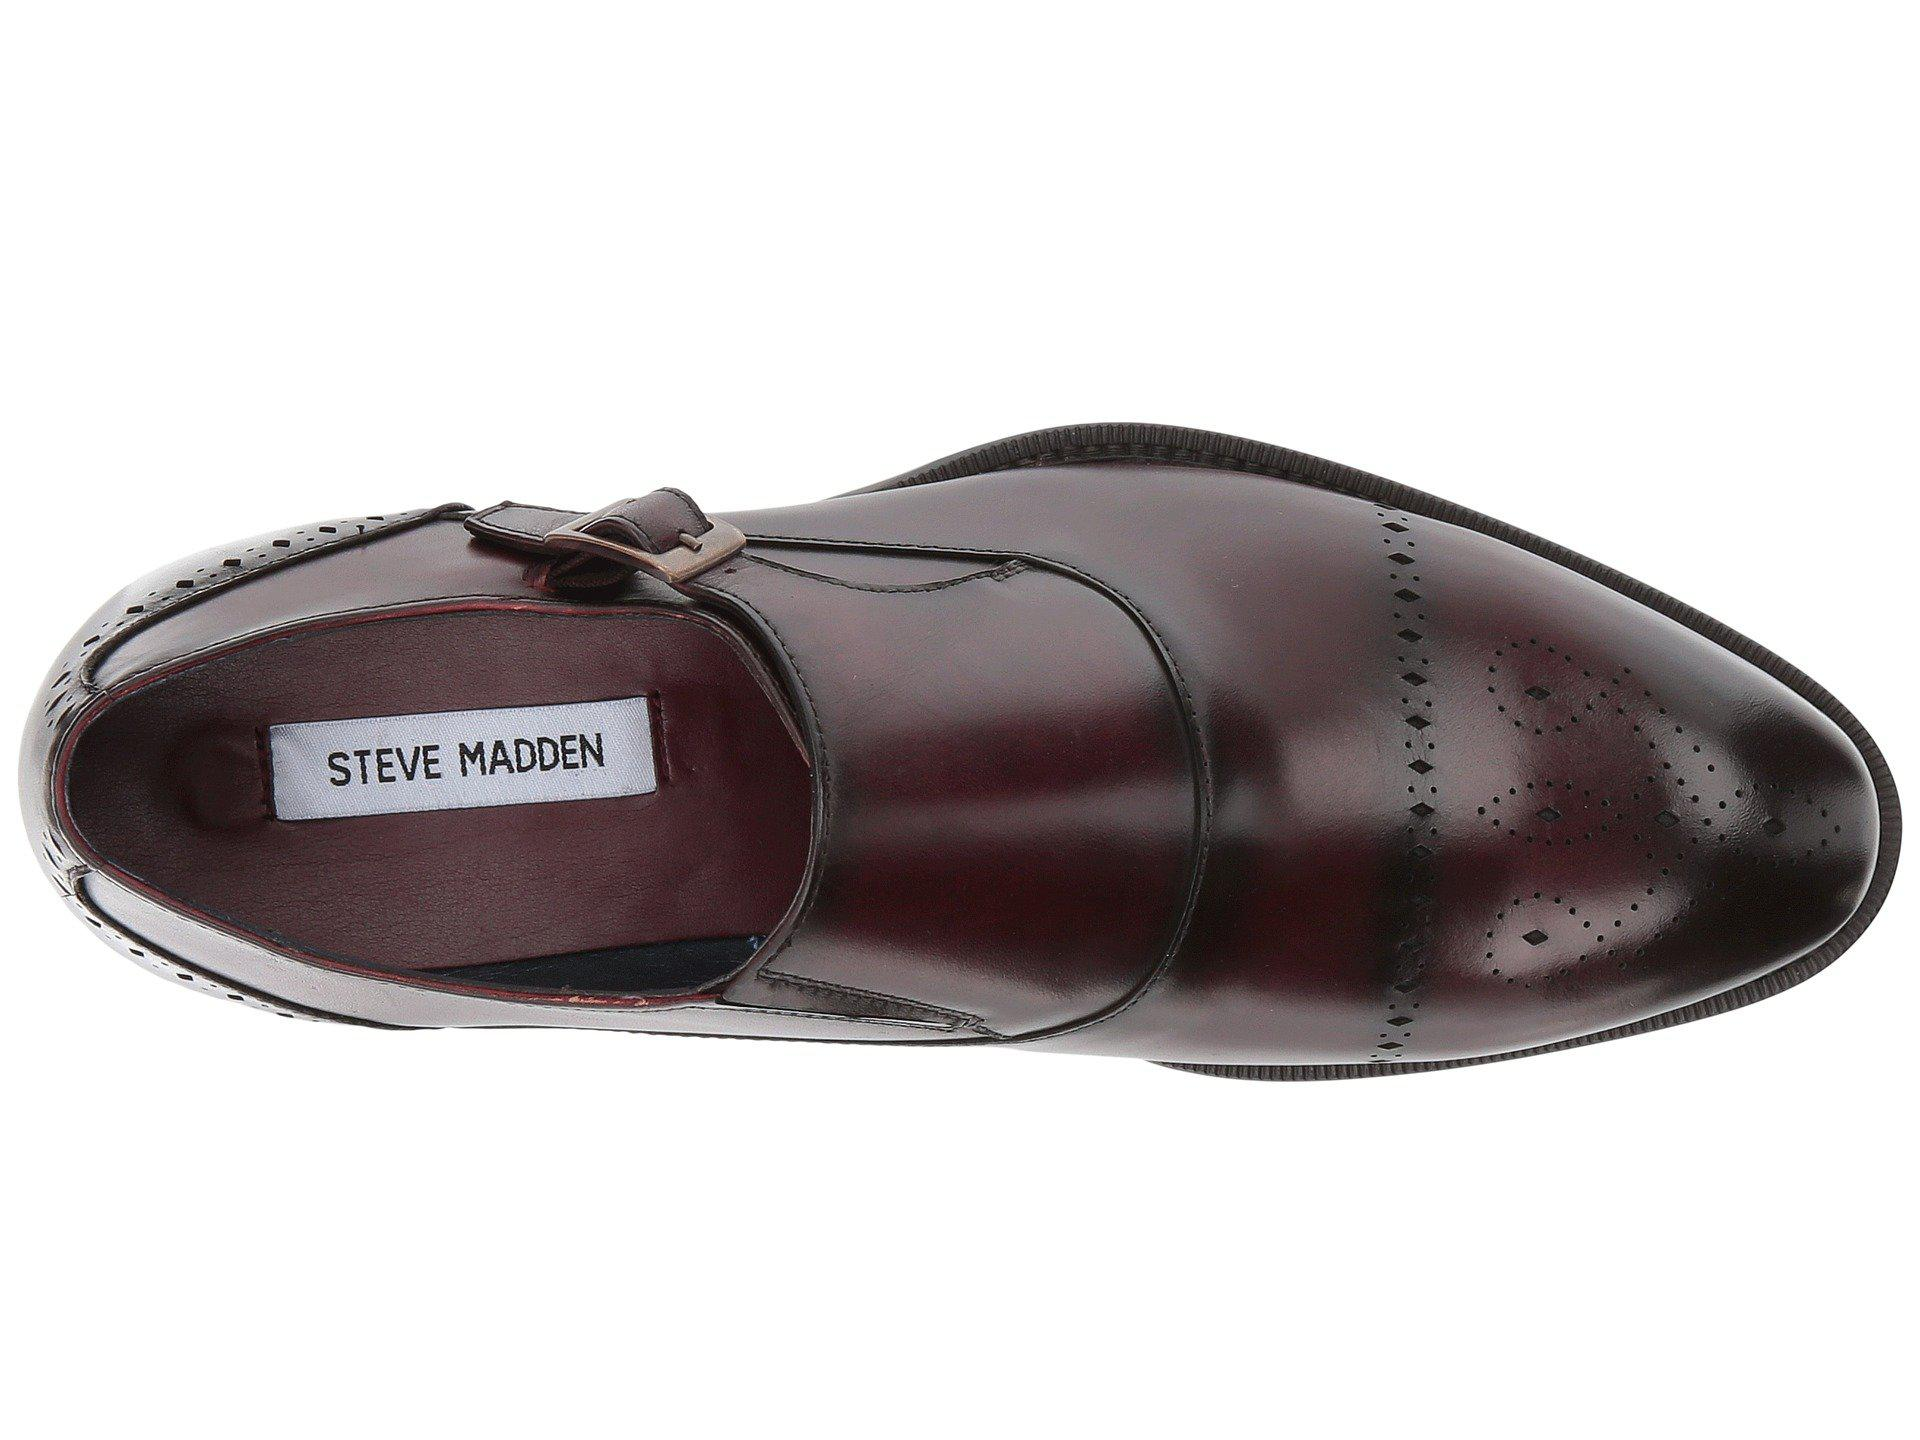 598dc857a9c Lyst - Steve Madden Caige (burgundy) Men s Shoes in Brown for Men